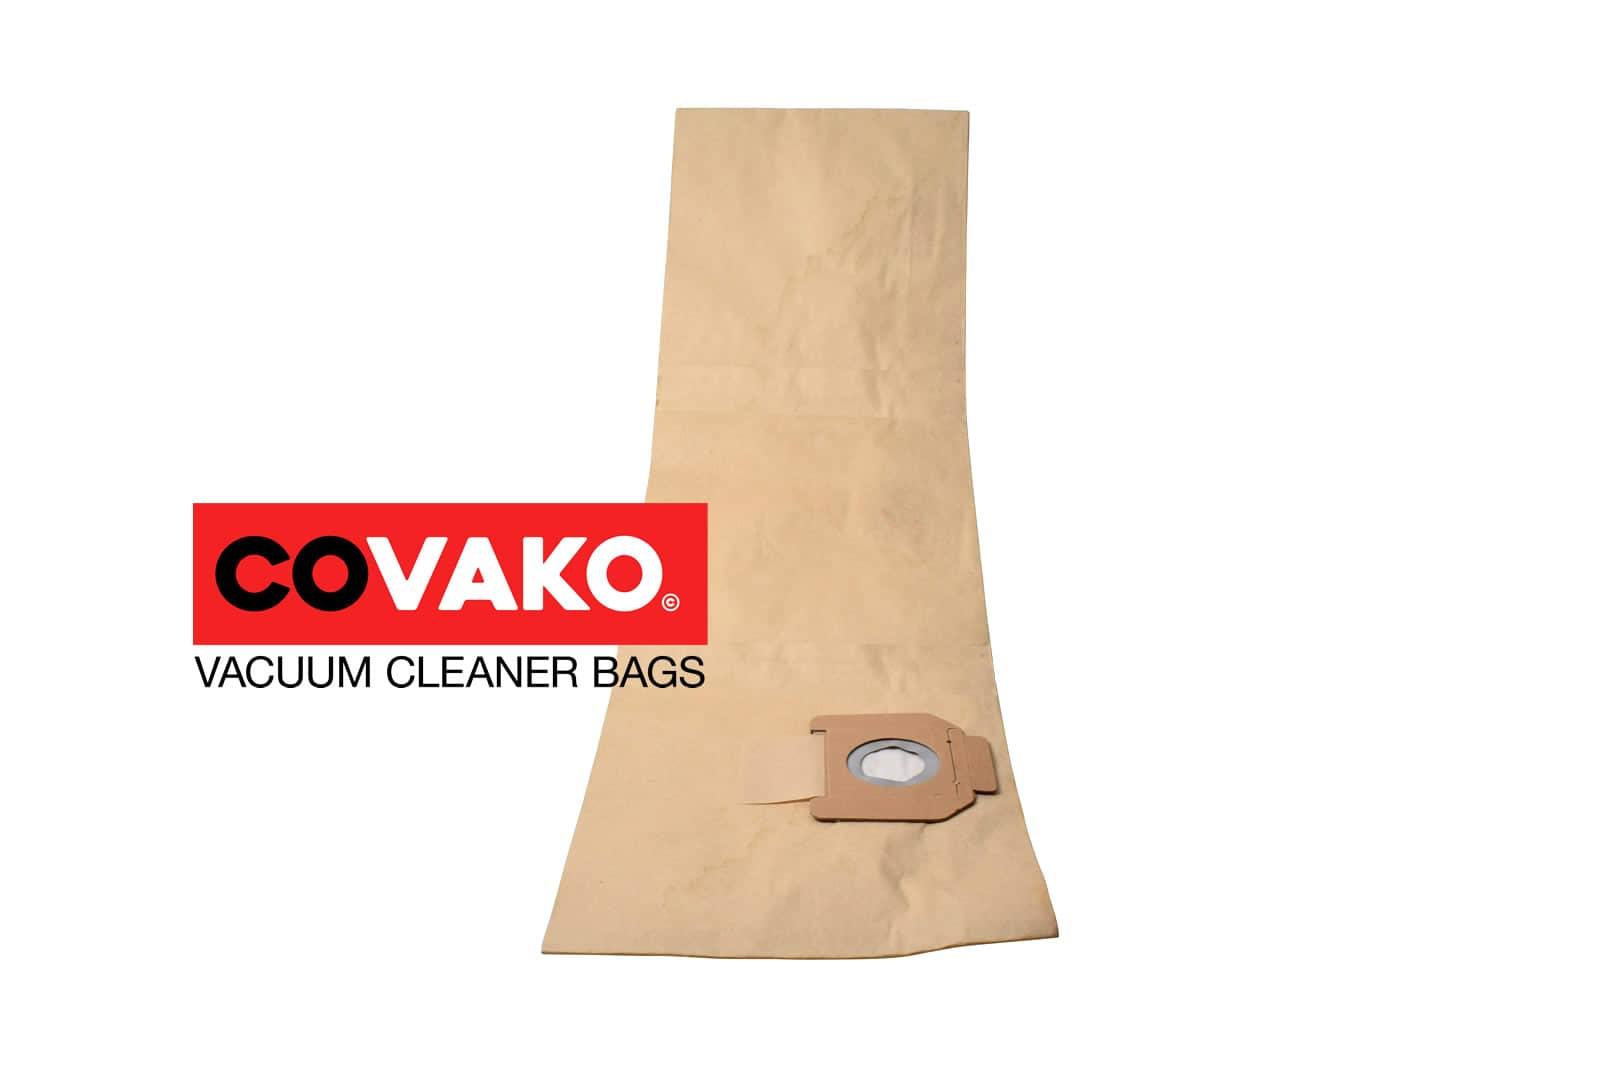 Stihl SE 100 / Papier - Stihl sacs d'aspirateur